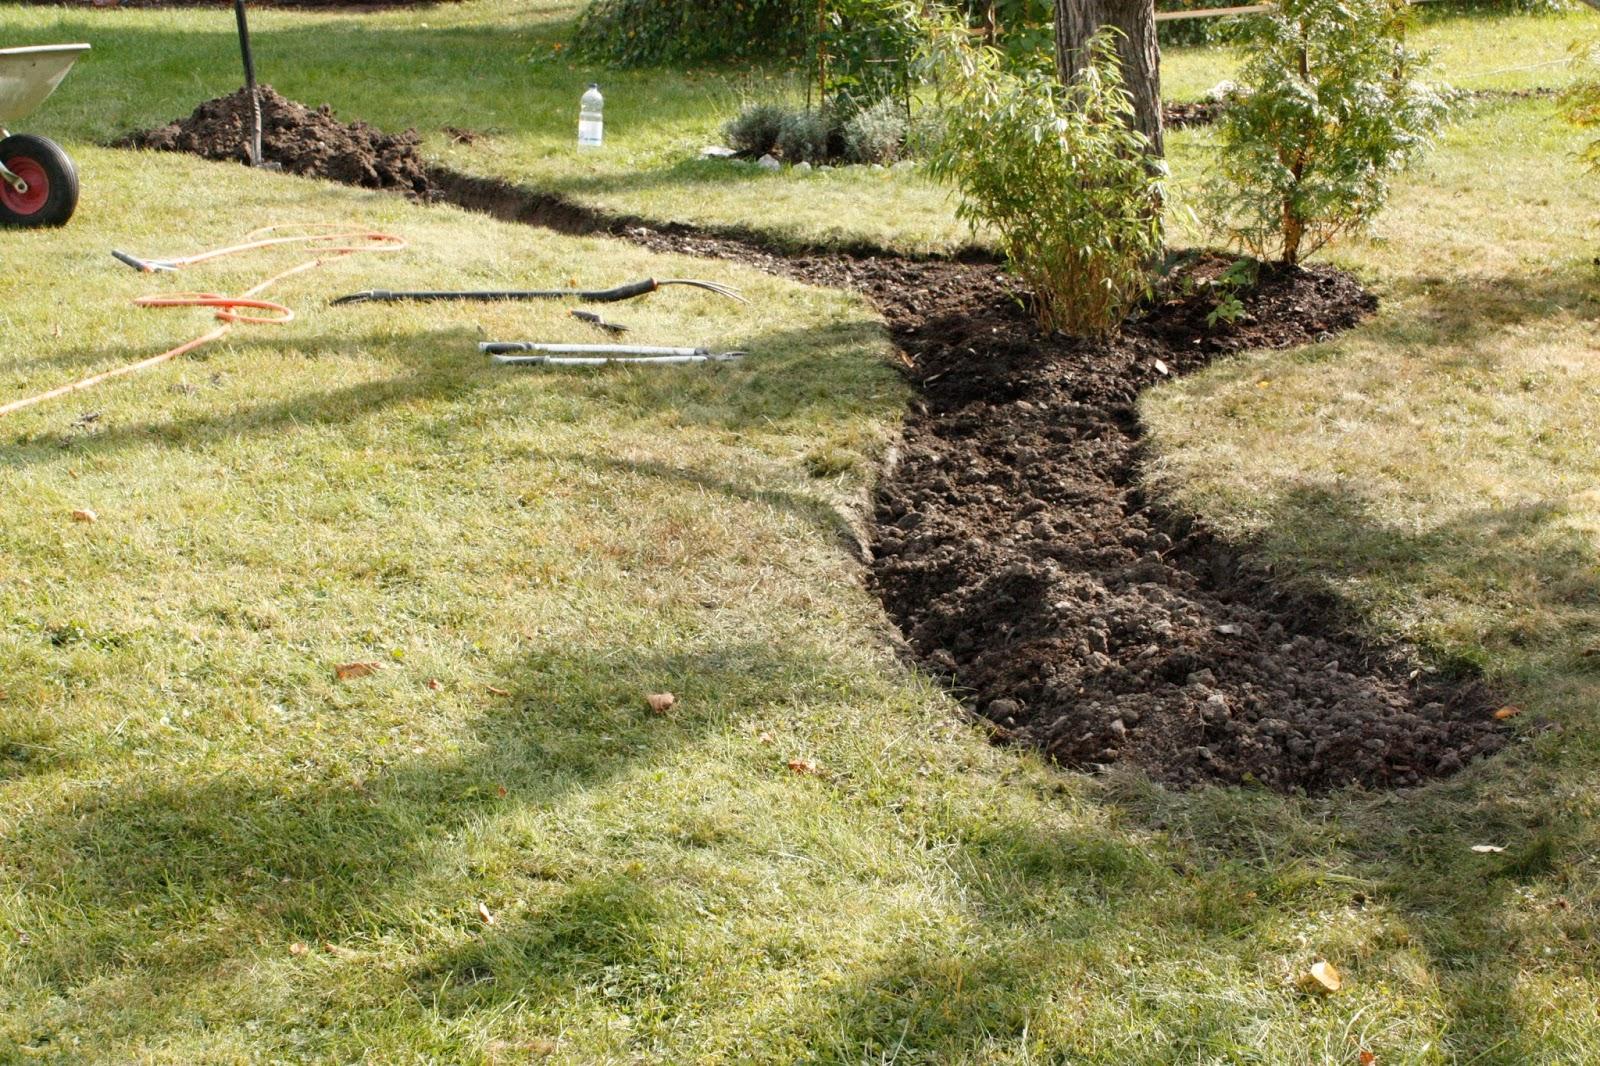 Josefins trädgård: gräv, gräv, gräv   bara gräv, gräv, gräv